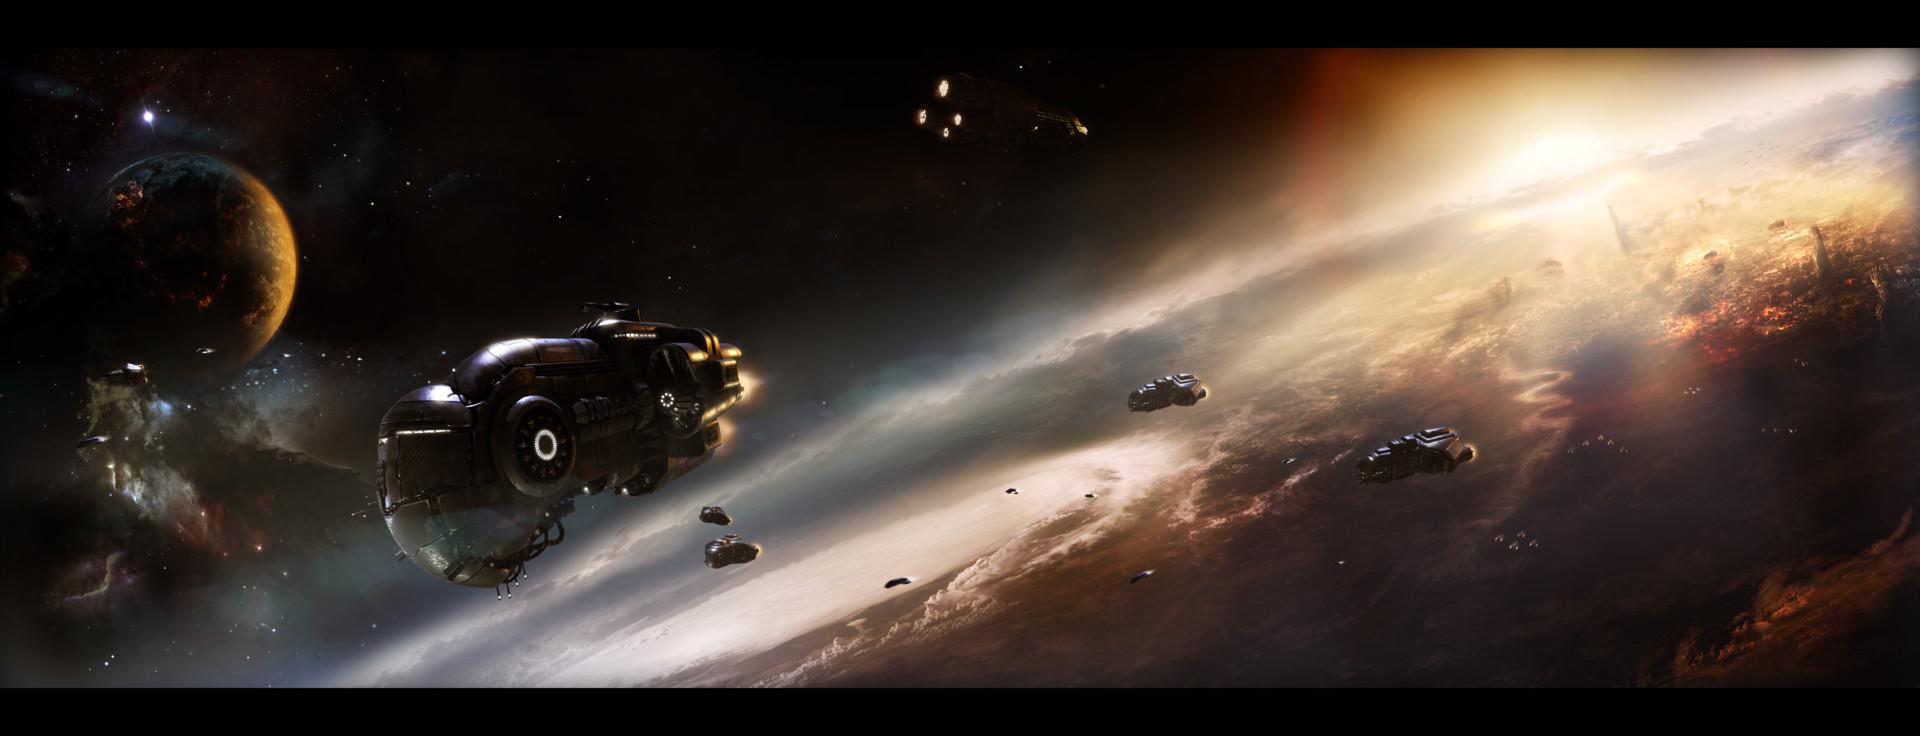 Tamas gyerman get my fleet off the orbit